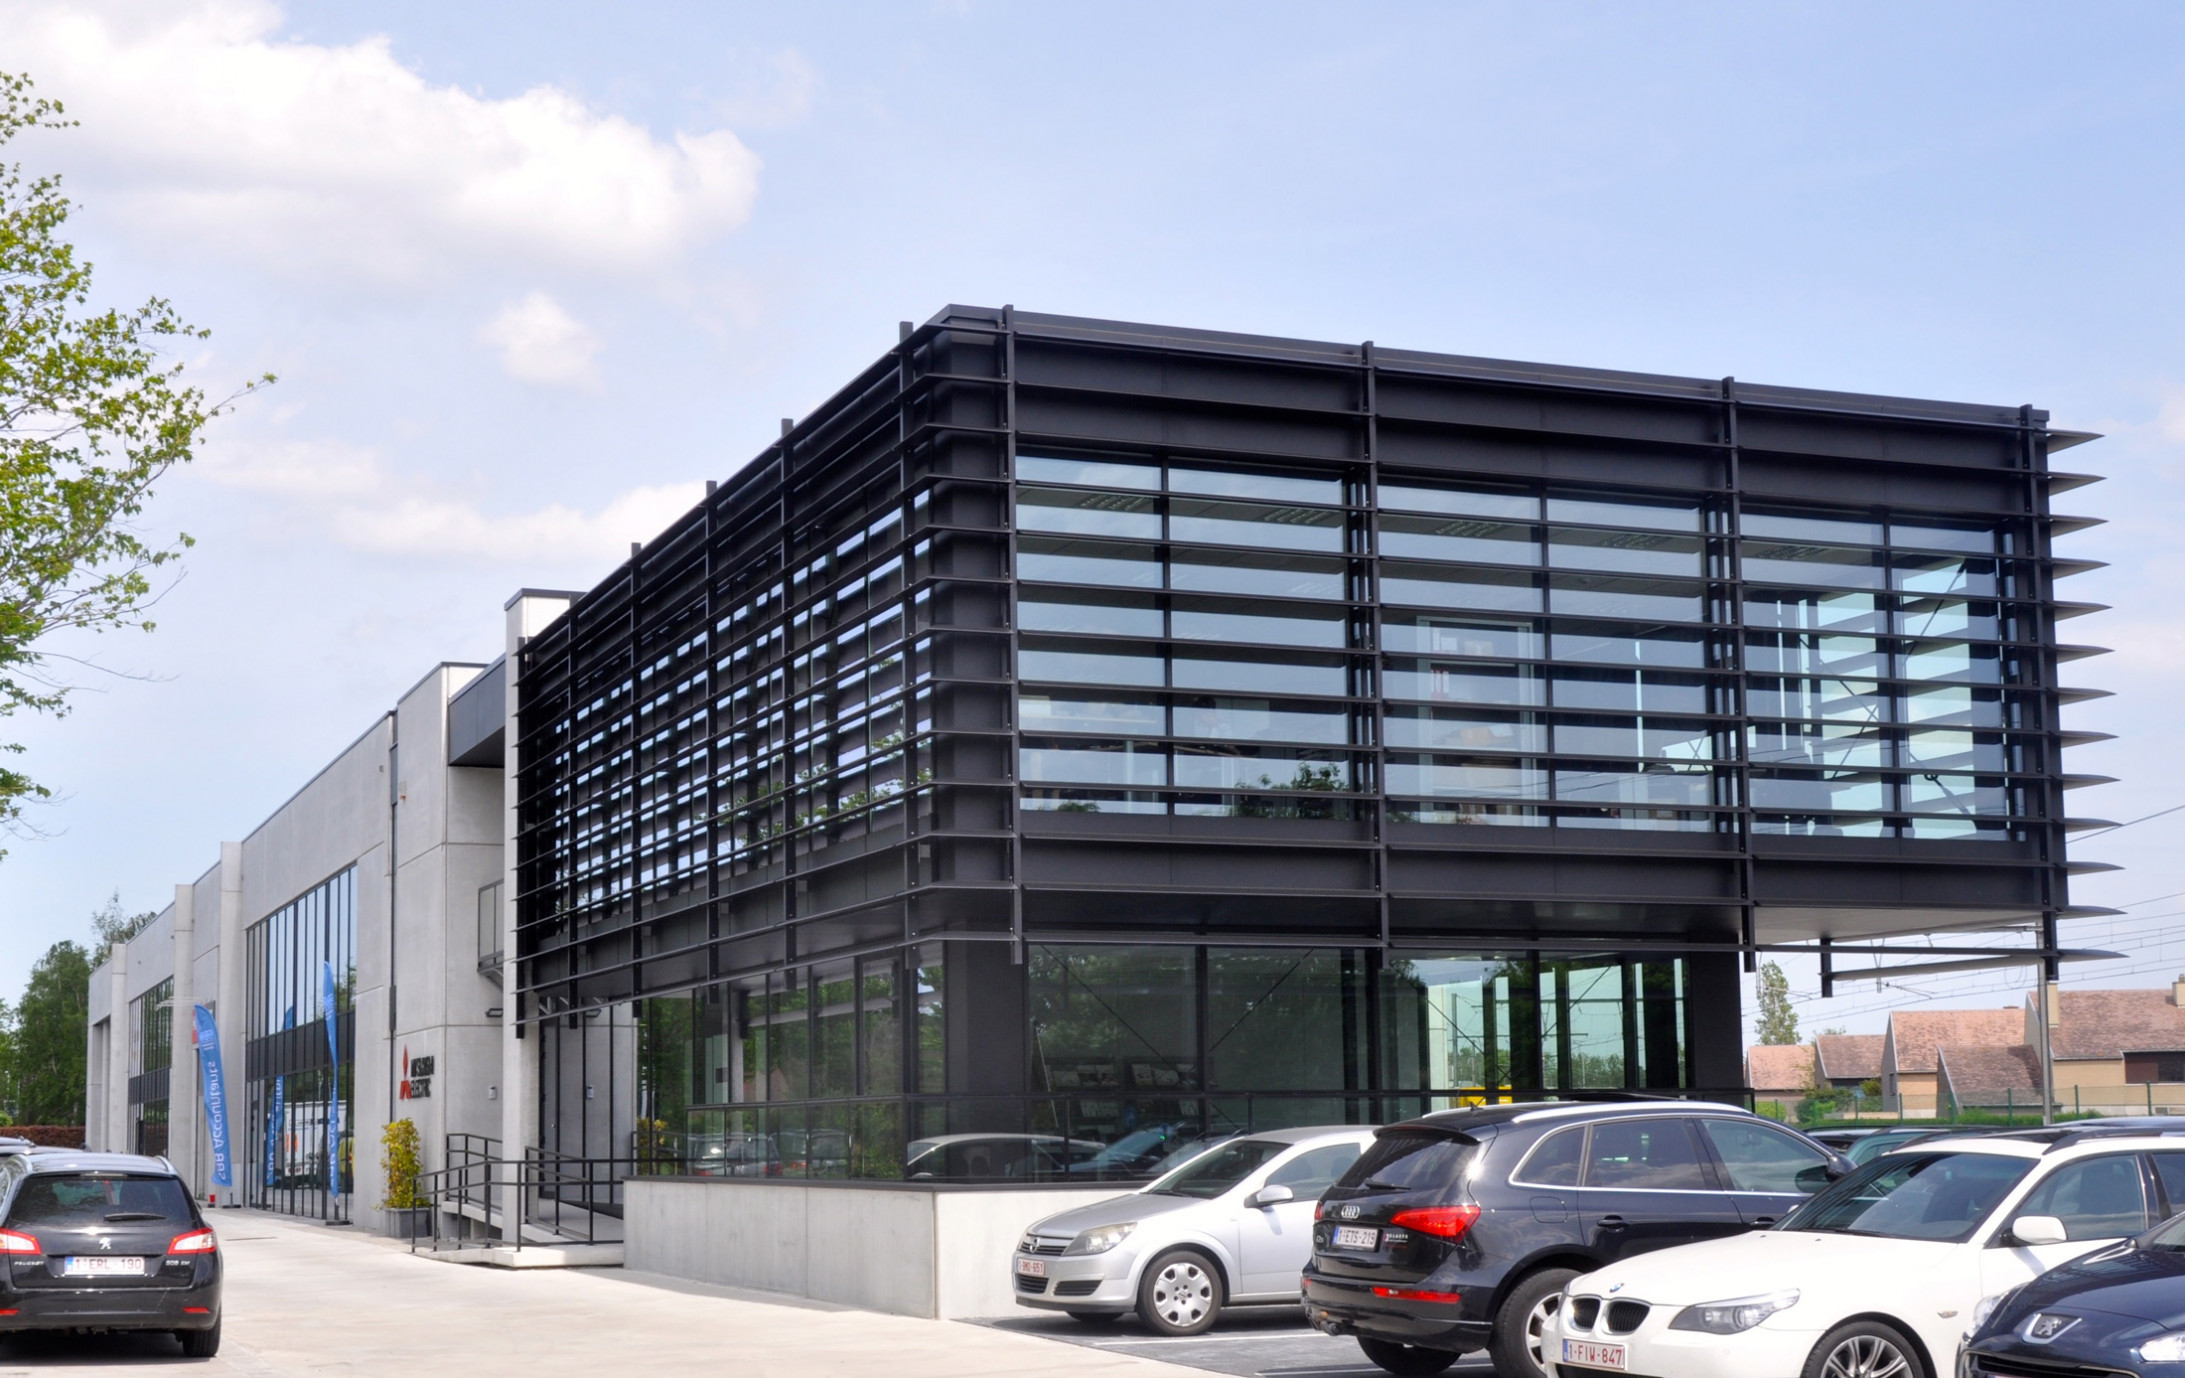 Kantoorgebouw Autobaan3_Brugge_Claeys Architecten